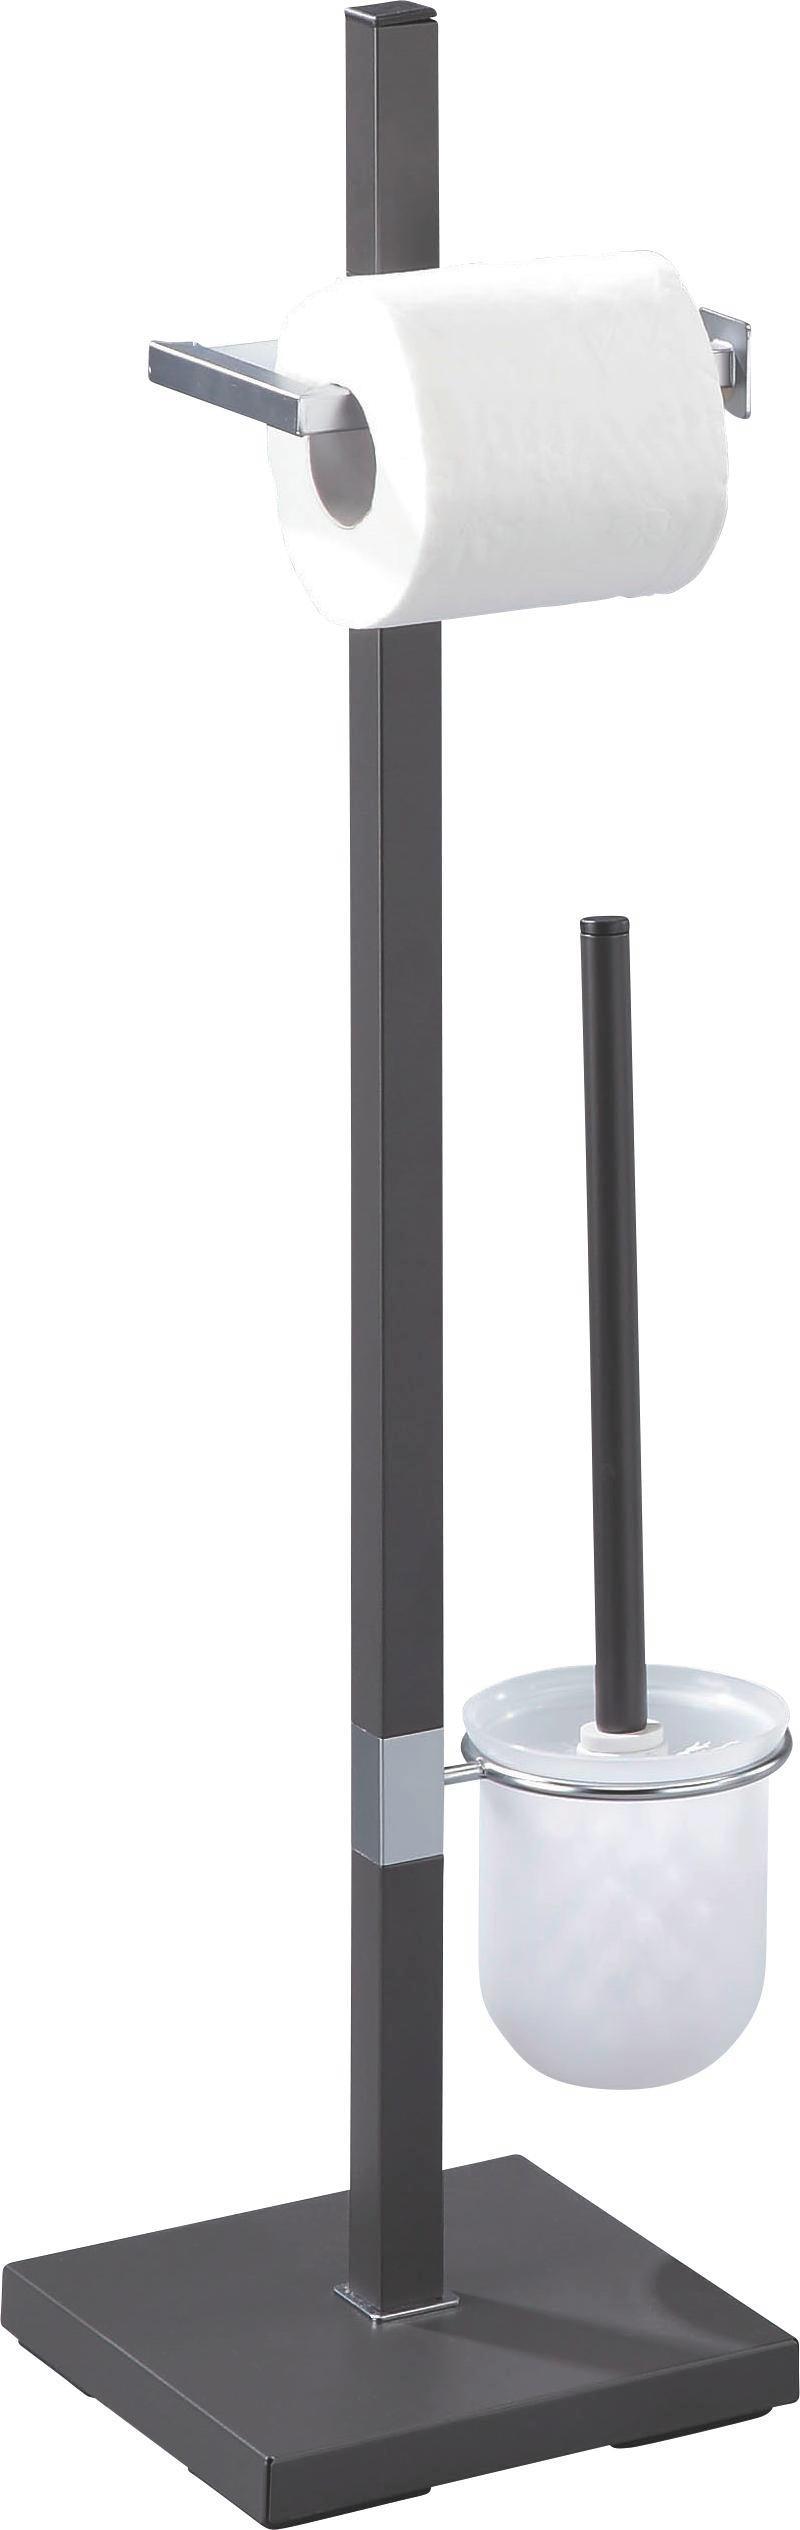 Wc-papírtartó Mode - antracit, modern, fém (22/76/18cm) - HOMEZONE